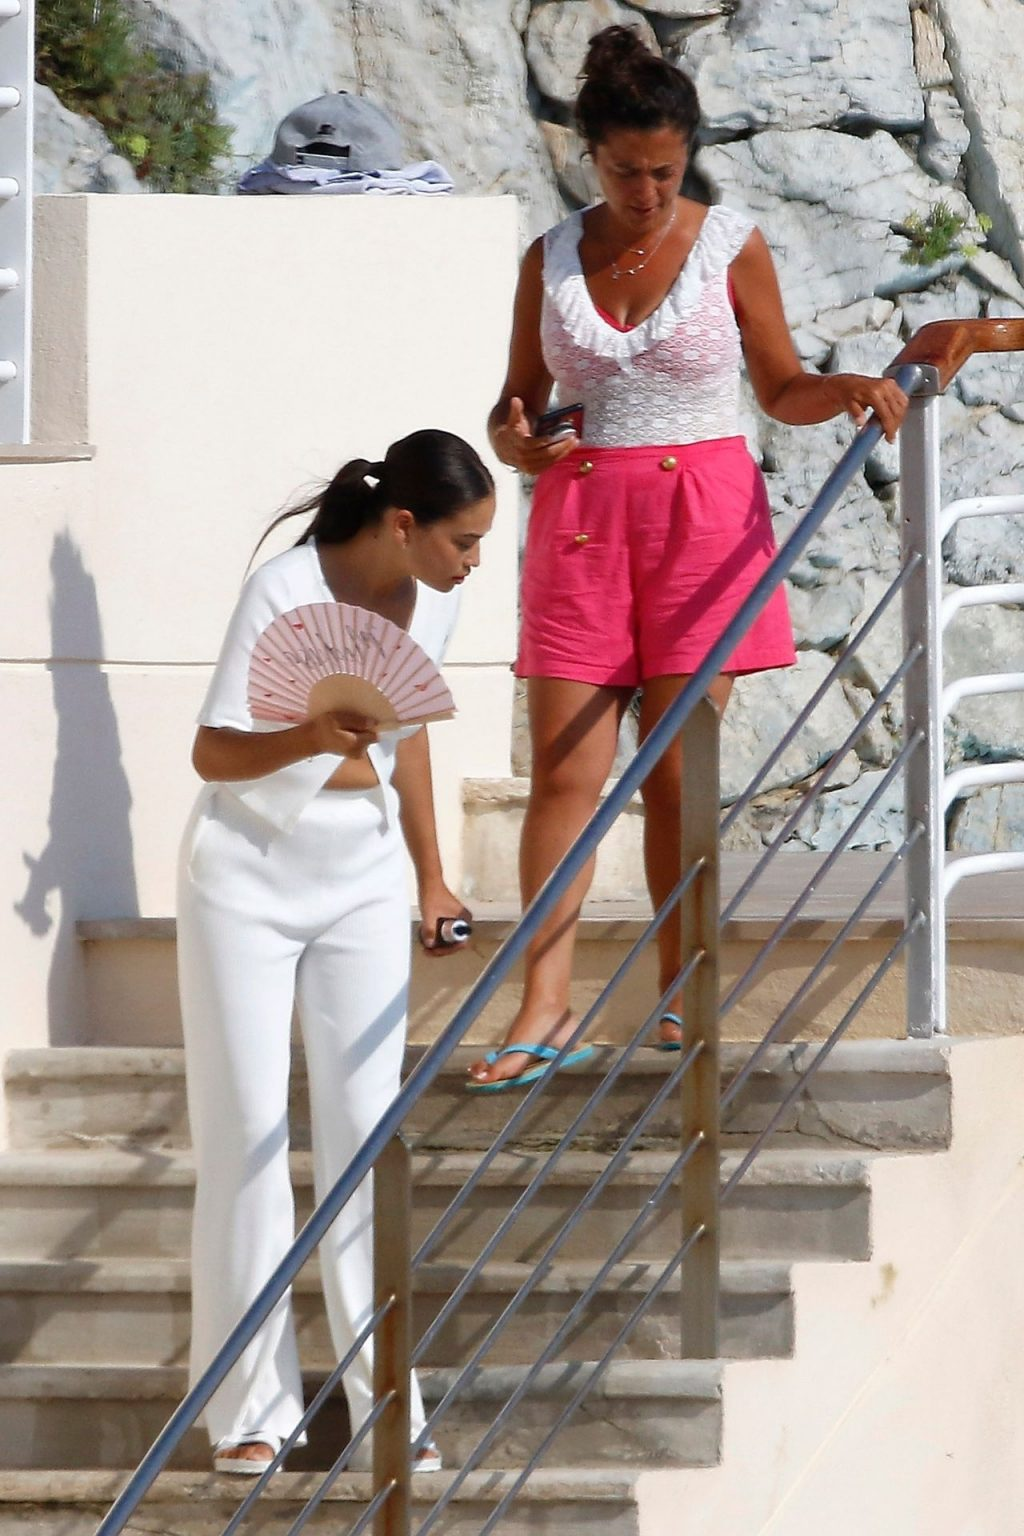 Braless Shanina Shaik Enjoys a Sunny Day with Her Friends (150 Photos)